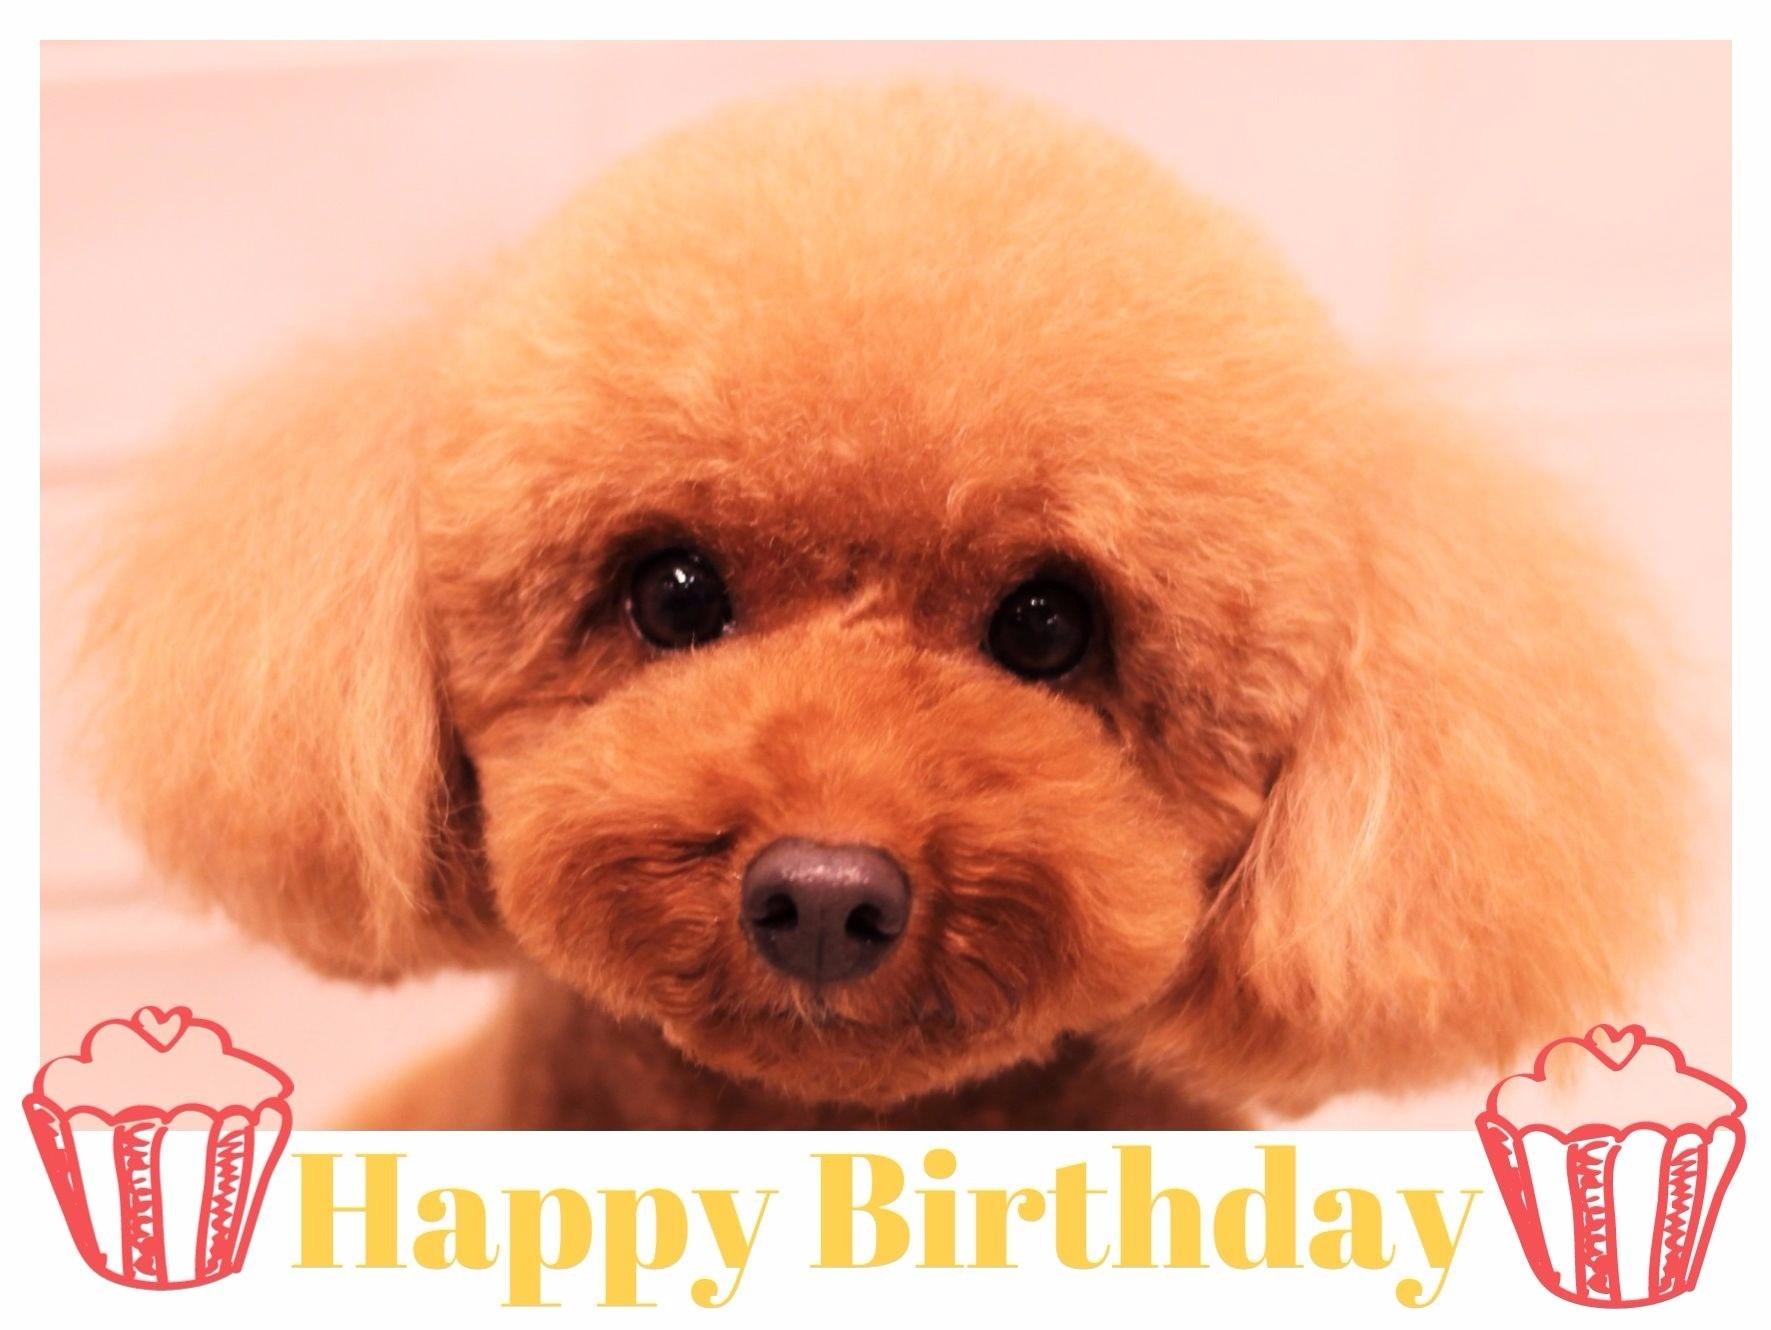 Happy Birthday ♡ マリンちゃん_d0060413_10125429.jpg